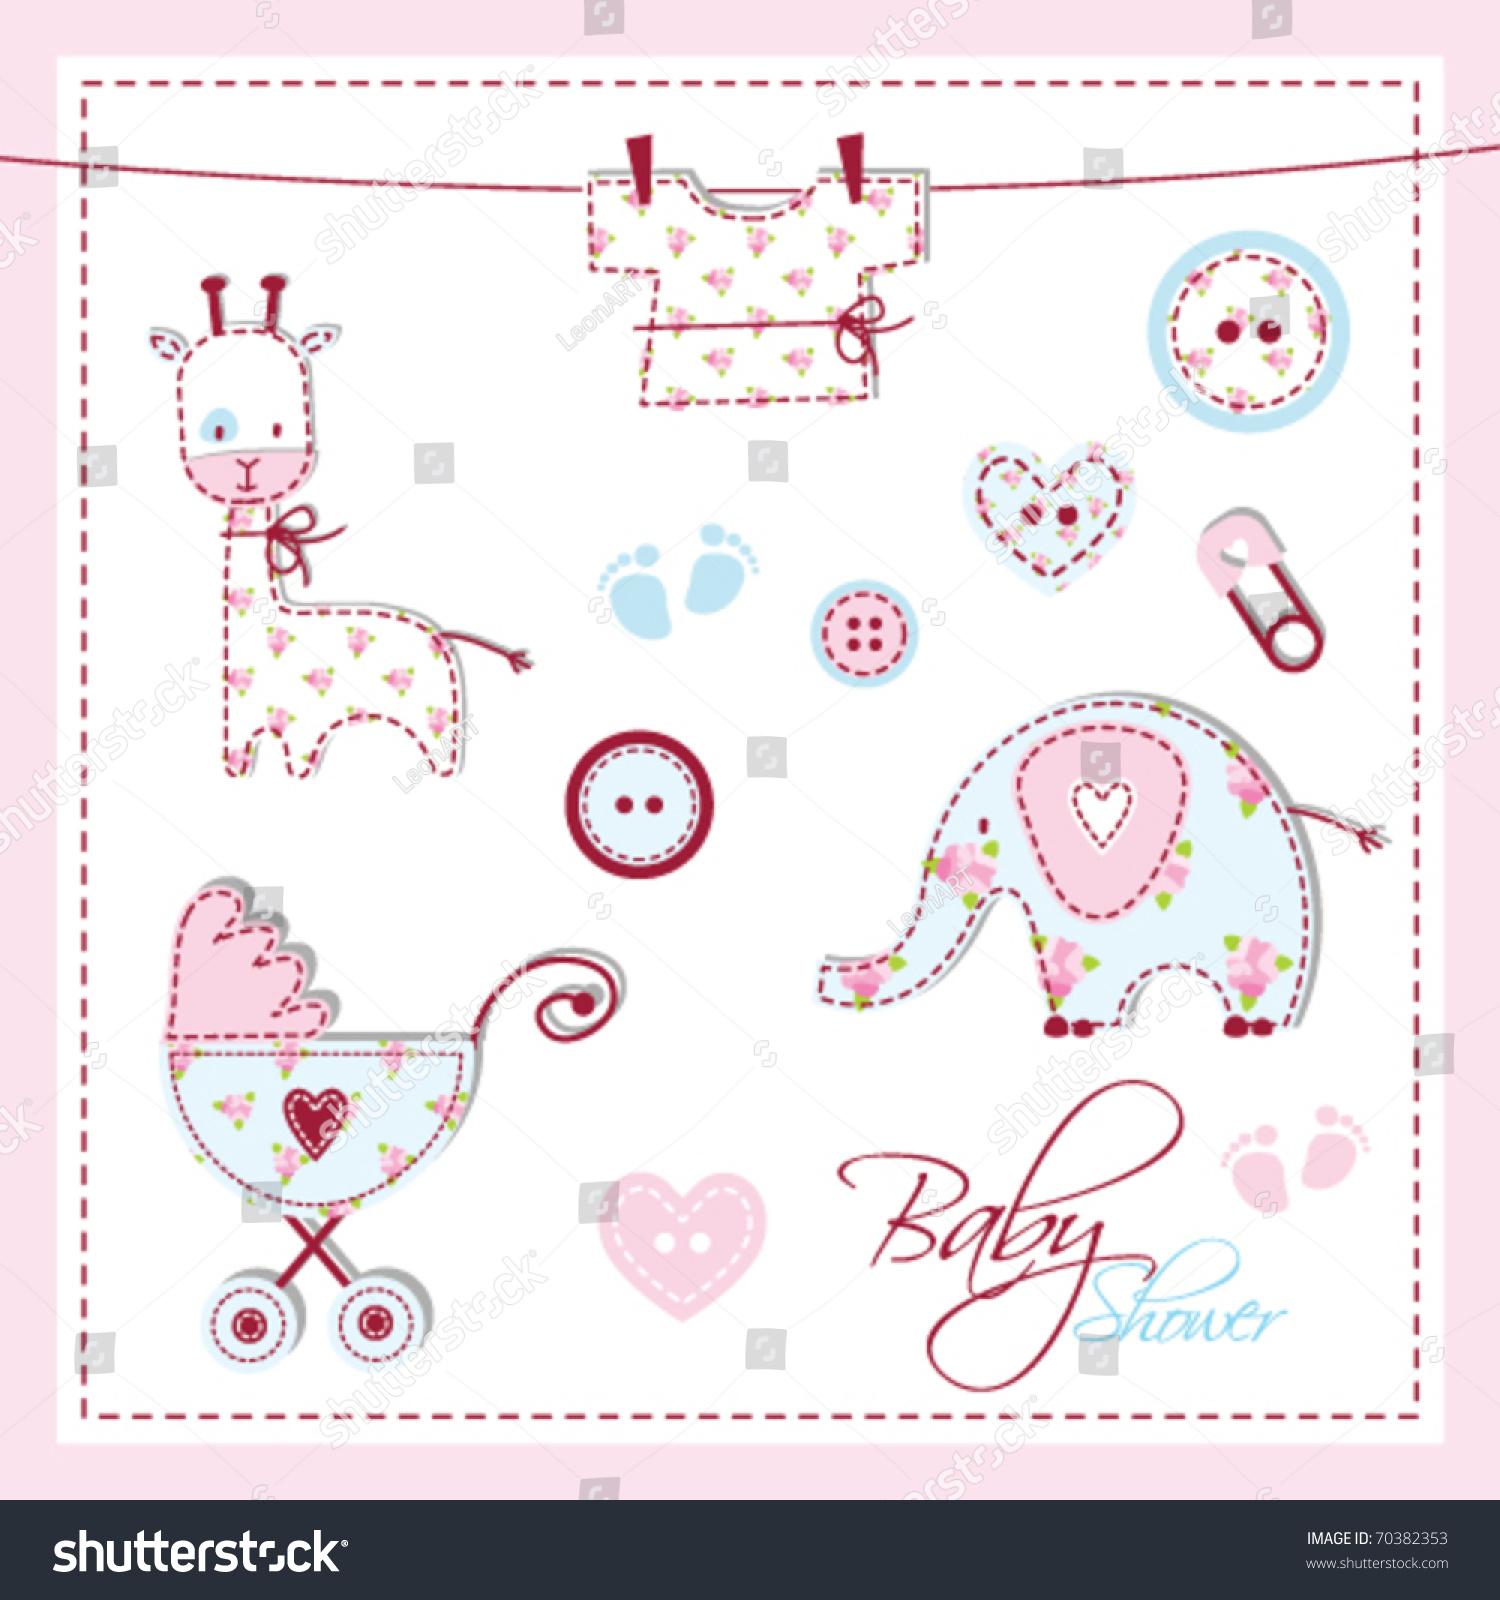 Royalty Free Scrapbook Design Elements Baby Shower 70382353 Stock